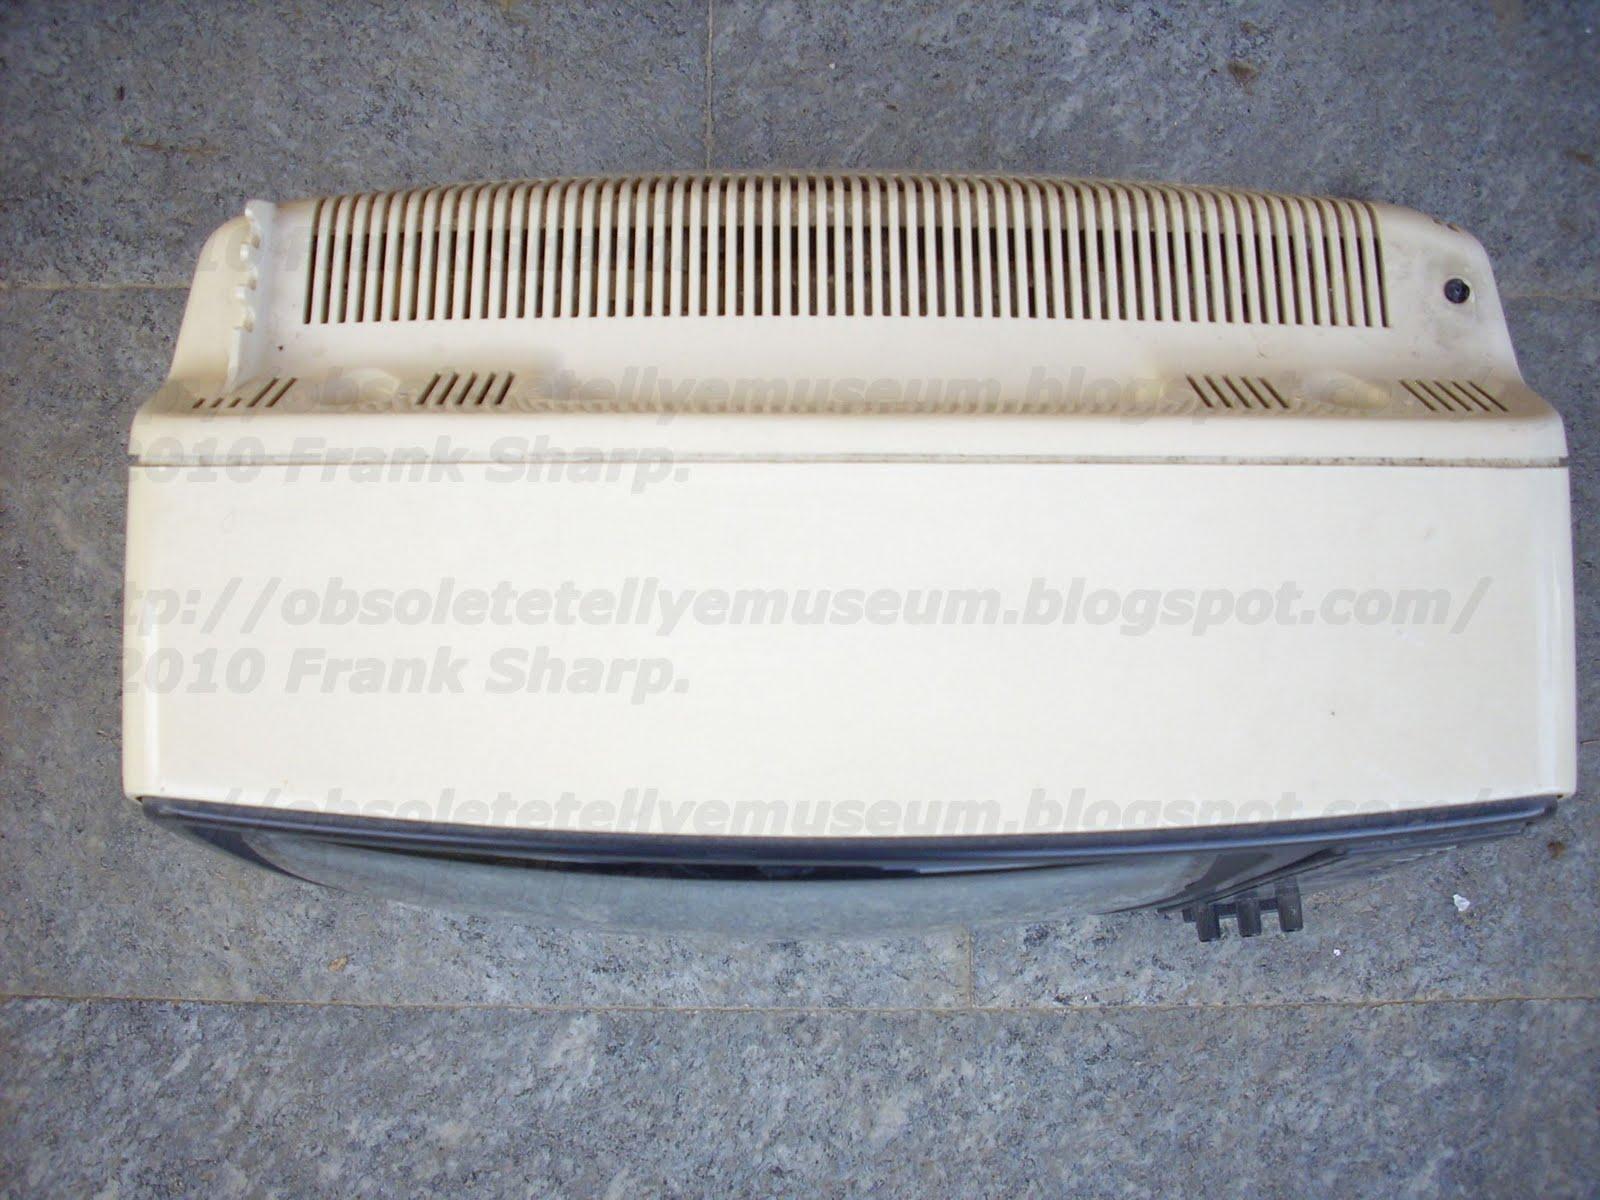 Obsolete Technology Tellye !: GRUNDIG TRIUMPH 1220 IT YEAR 1978.